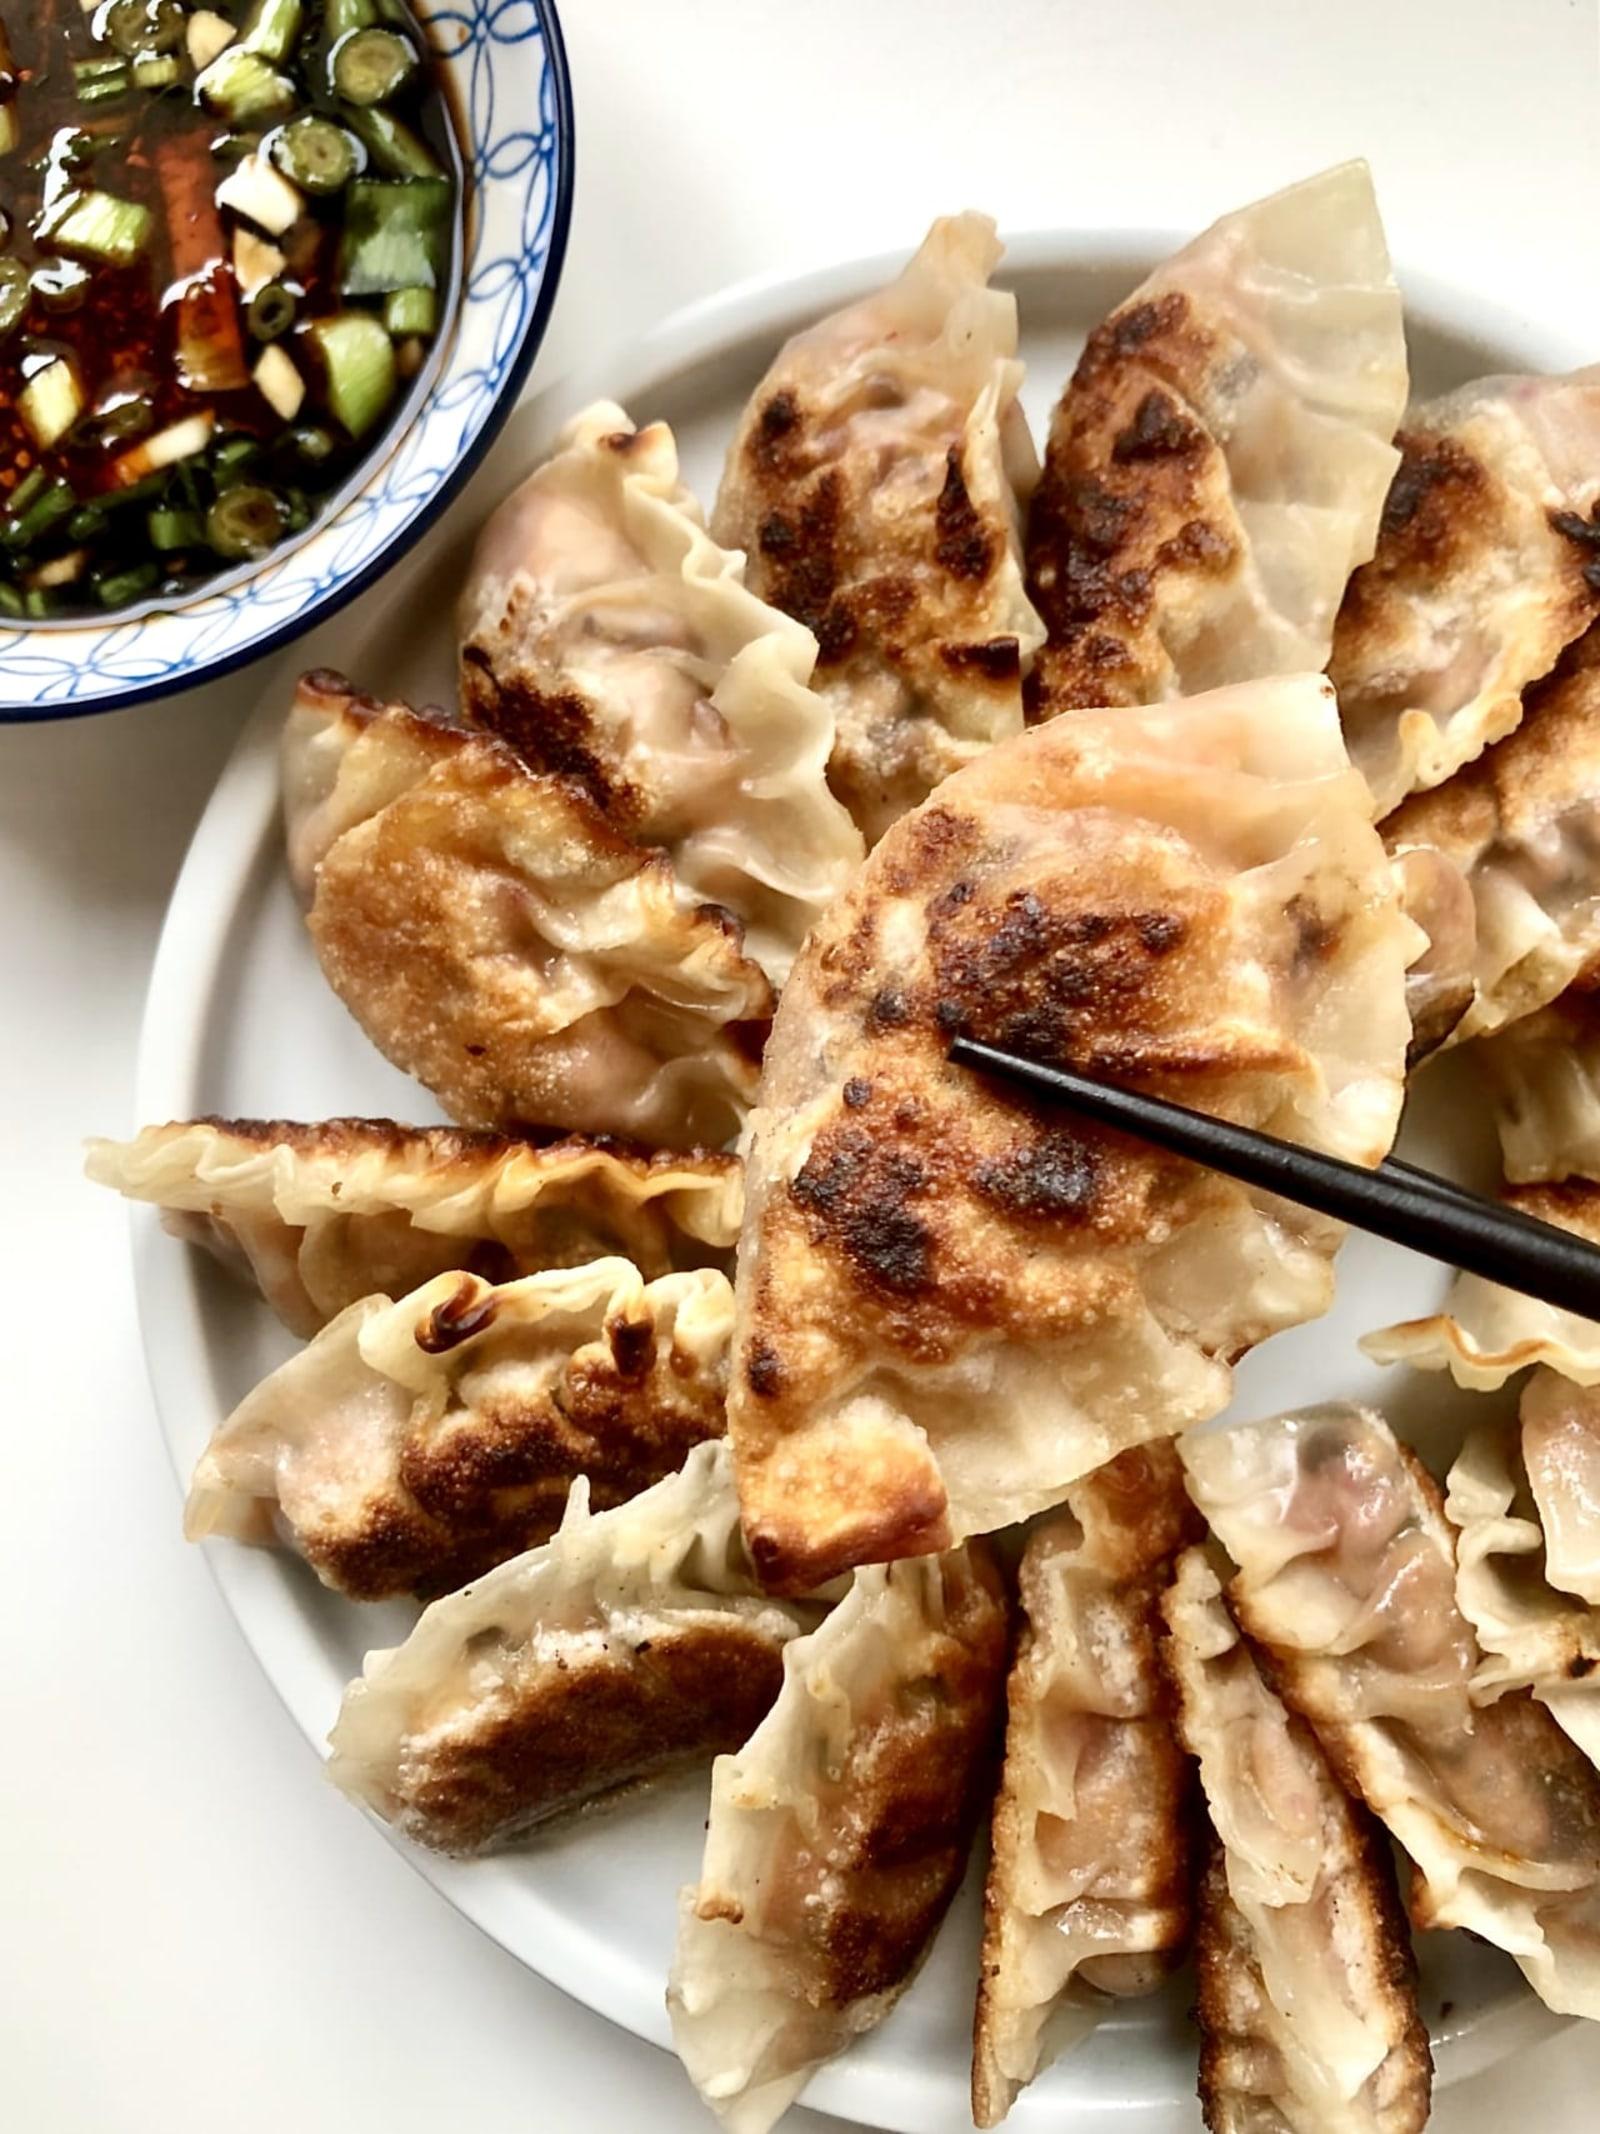 Image of Omnipork Cabbage Dumplings by @SincerelyAline